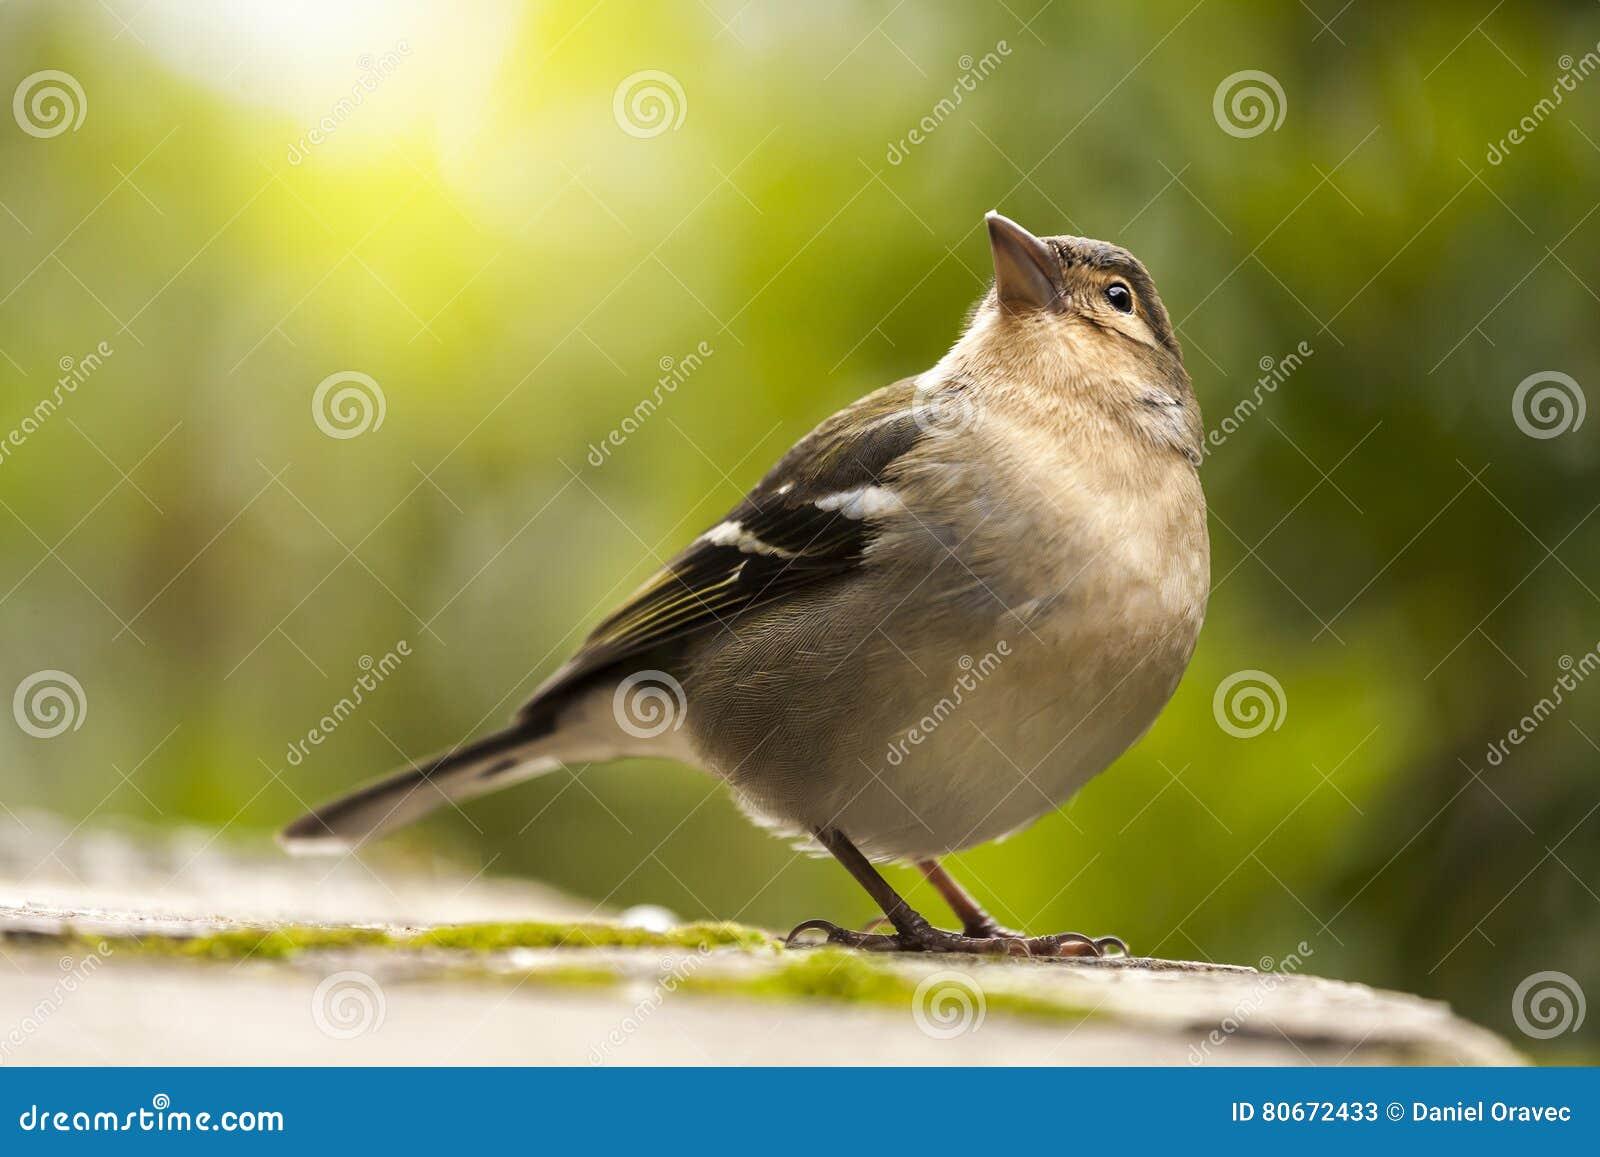 Chaffinch Bird Looking Up